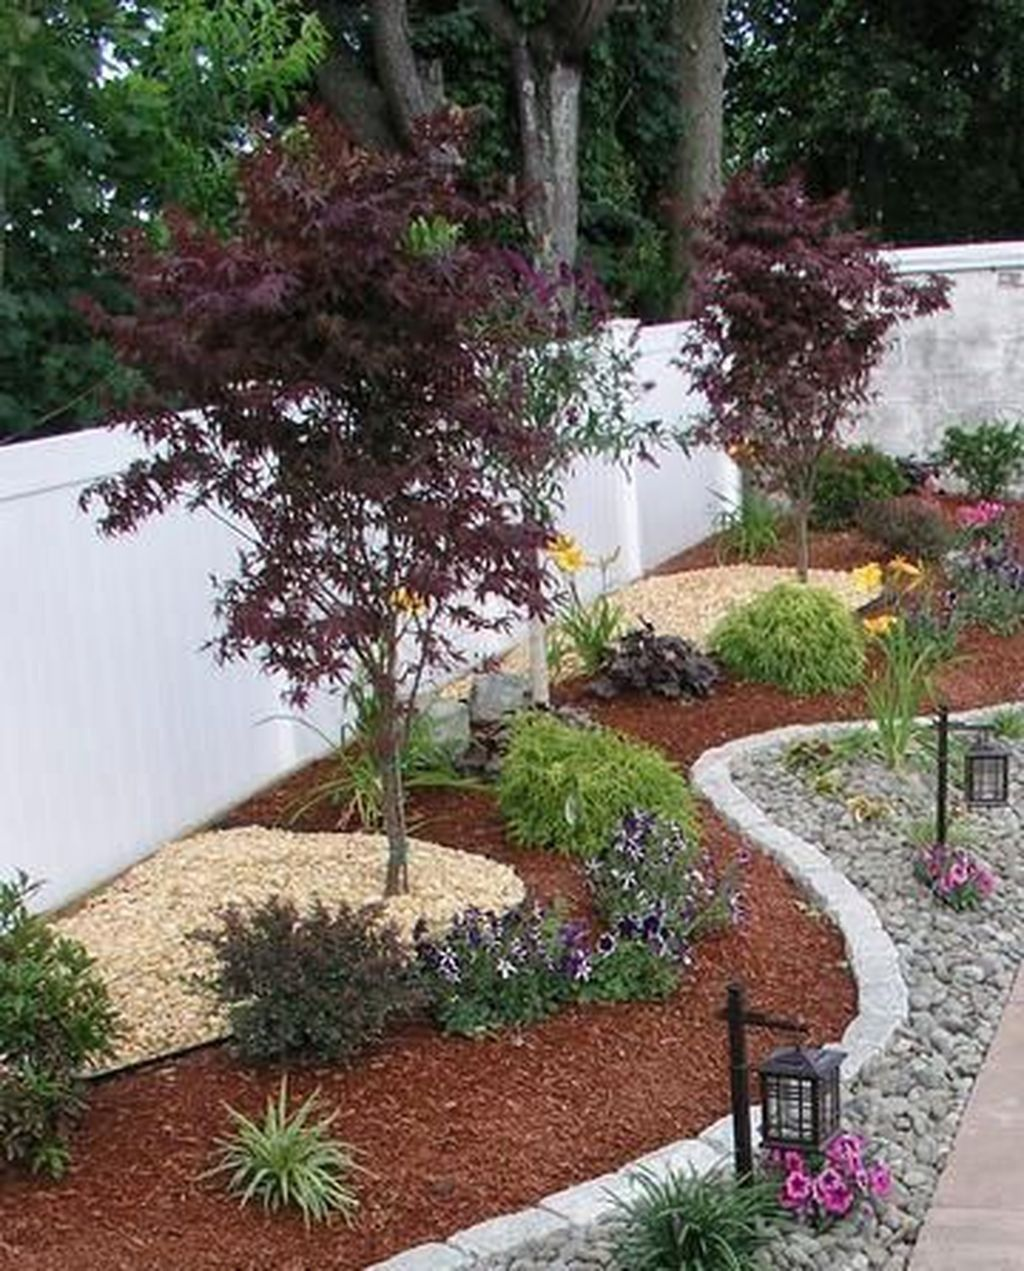 Beautiful Home Gardens Designs Ideas: 40+ Stunning Japanese Rock Garden Ideas For Beautiful Home